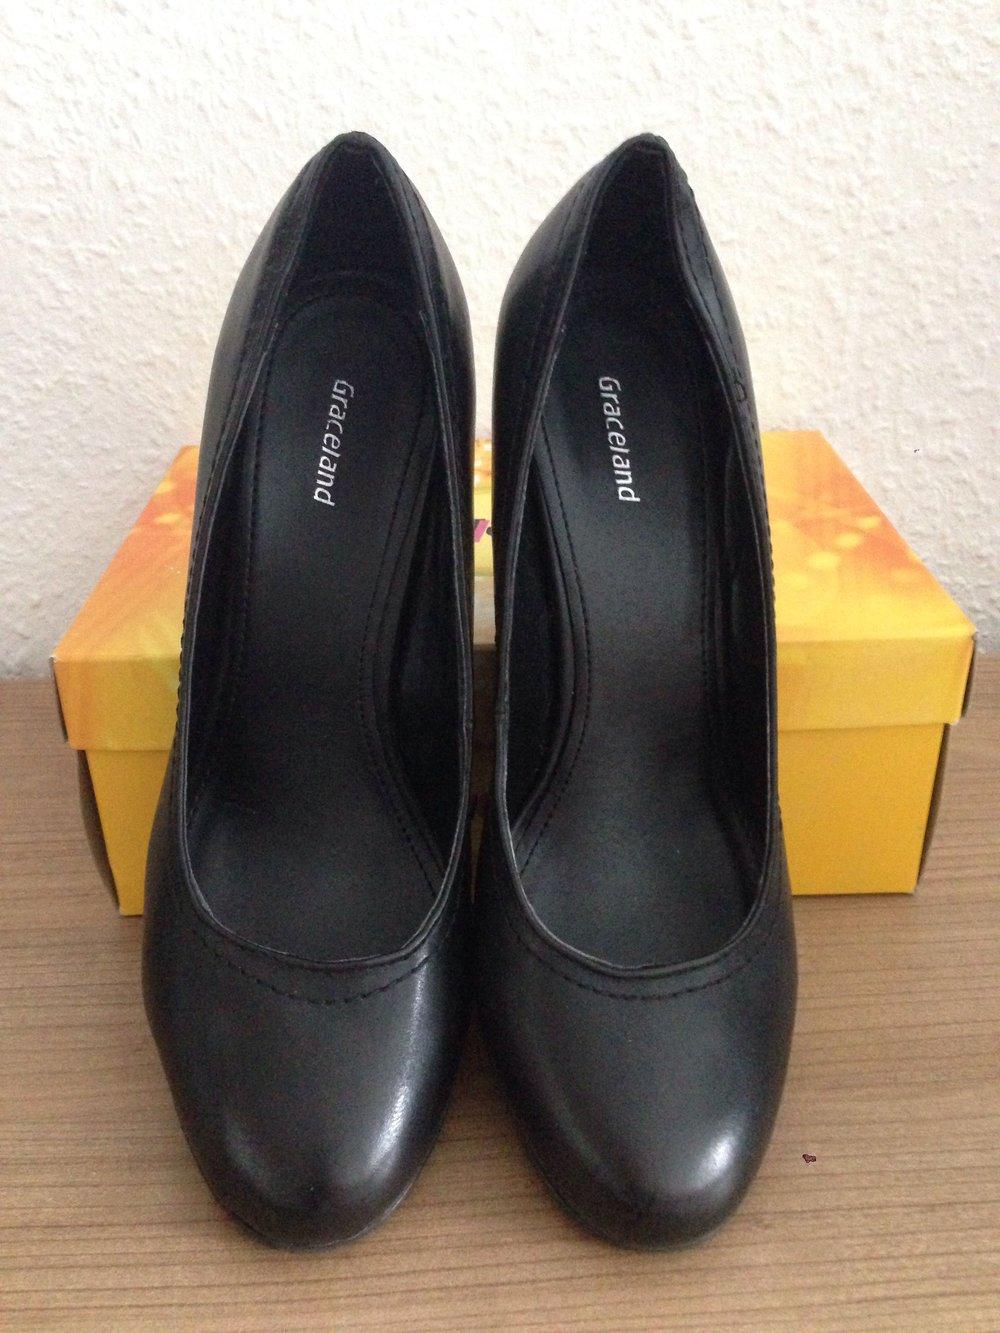 b6ce32ec46d939 Deichmann Graceland - Schuhe mit Absatz    Kleiderkorb.de